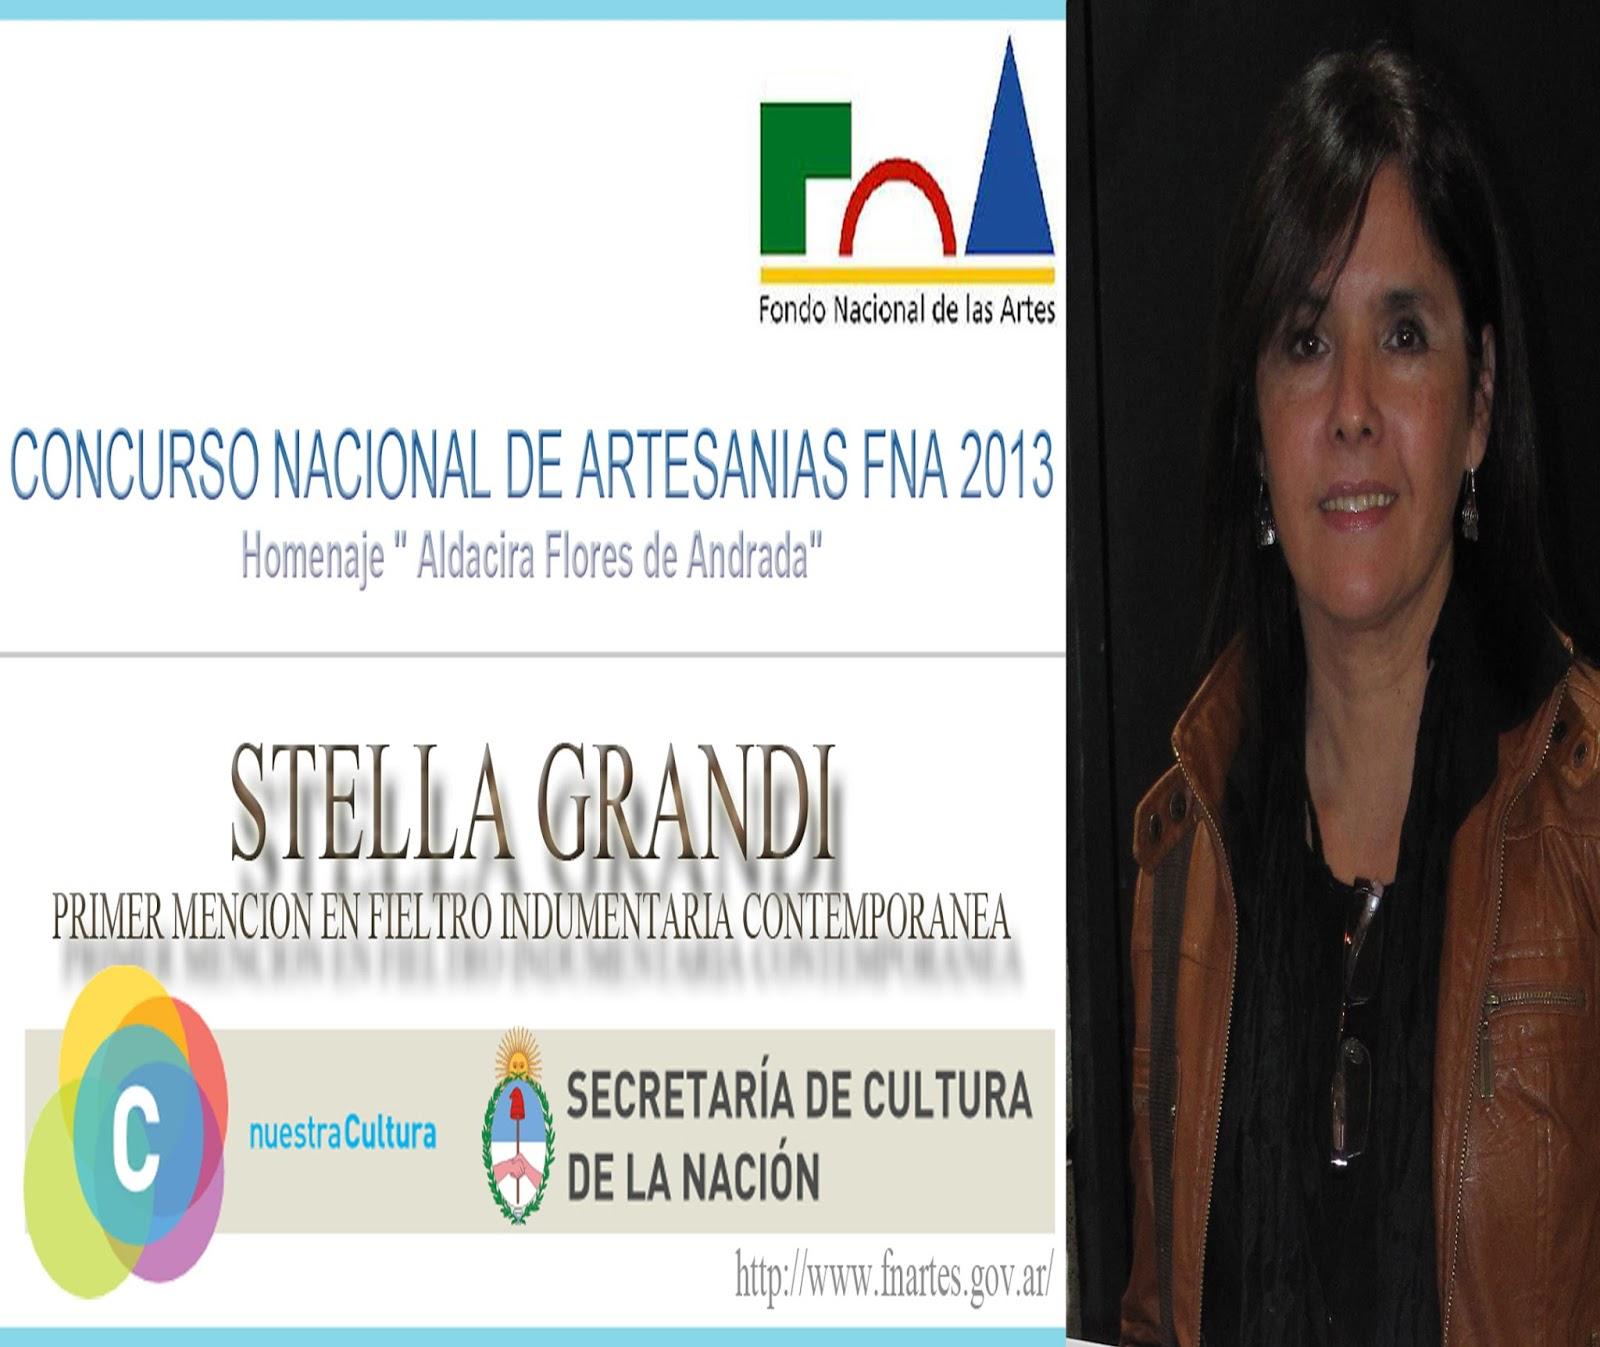 PREMIO FONDO NACIONAL DE LAS ARTES 2013 | CONCURSO DE ARTESANIAS